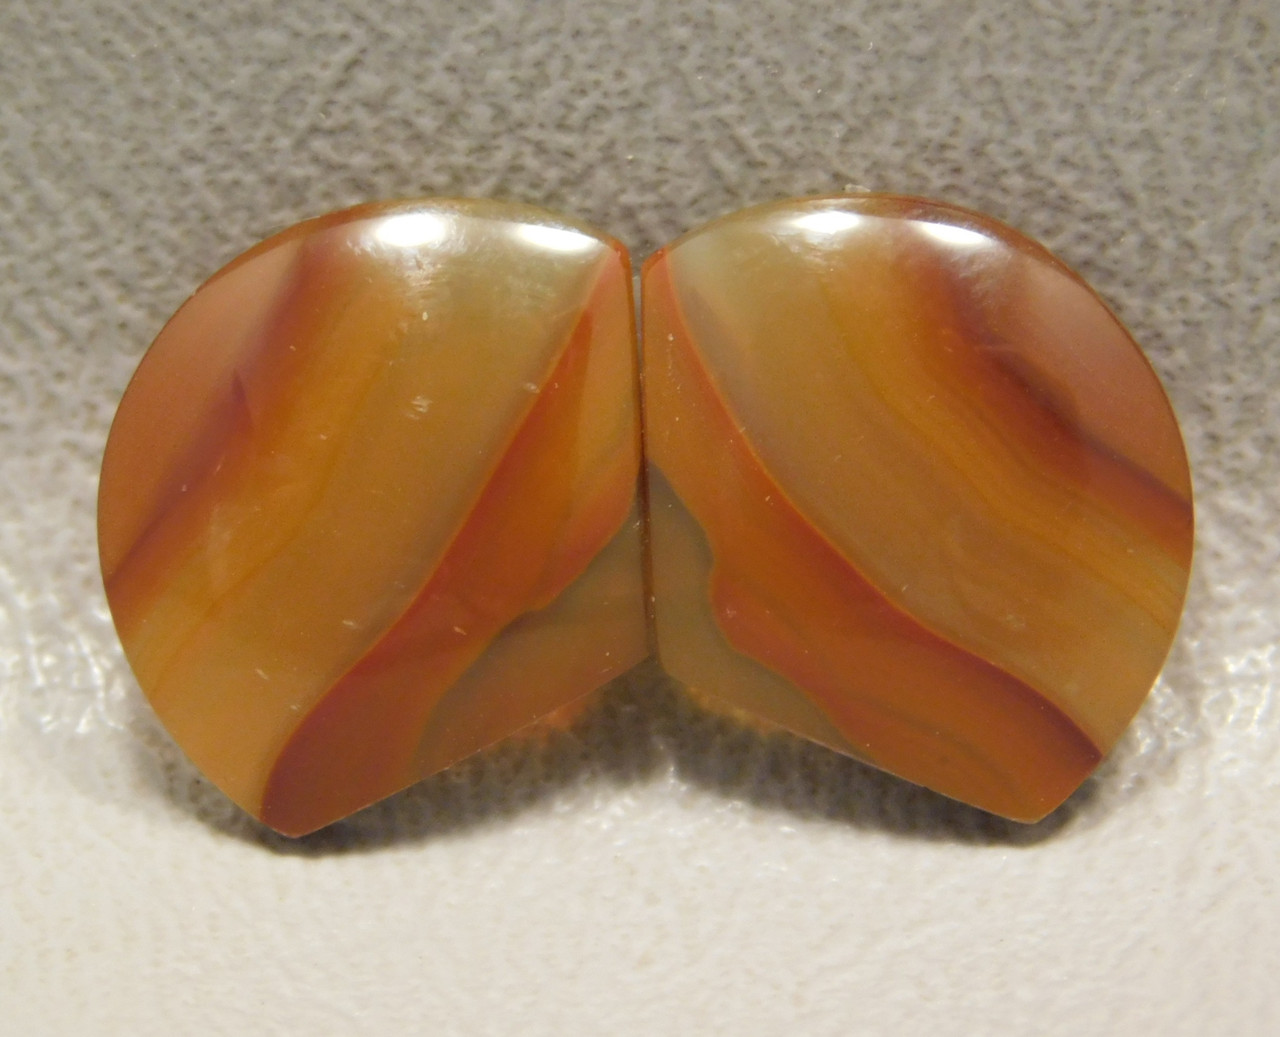 Brazilian Piranha Agate Matched Pair Cabochons Bar Gemstones #3